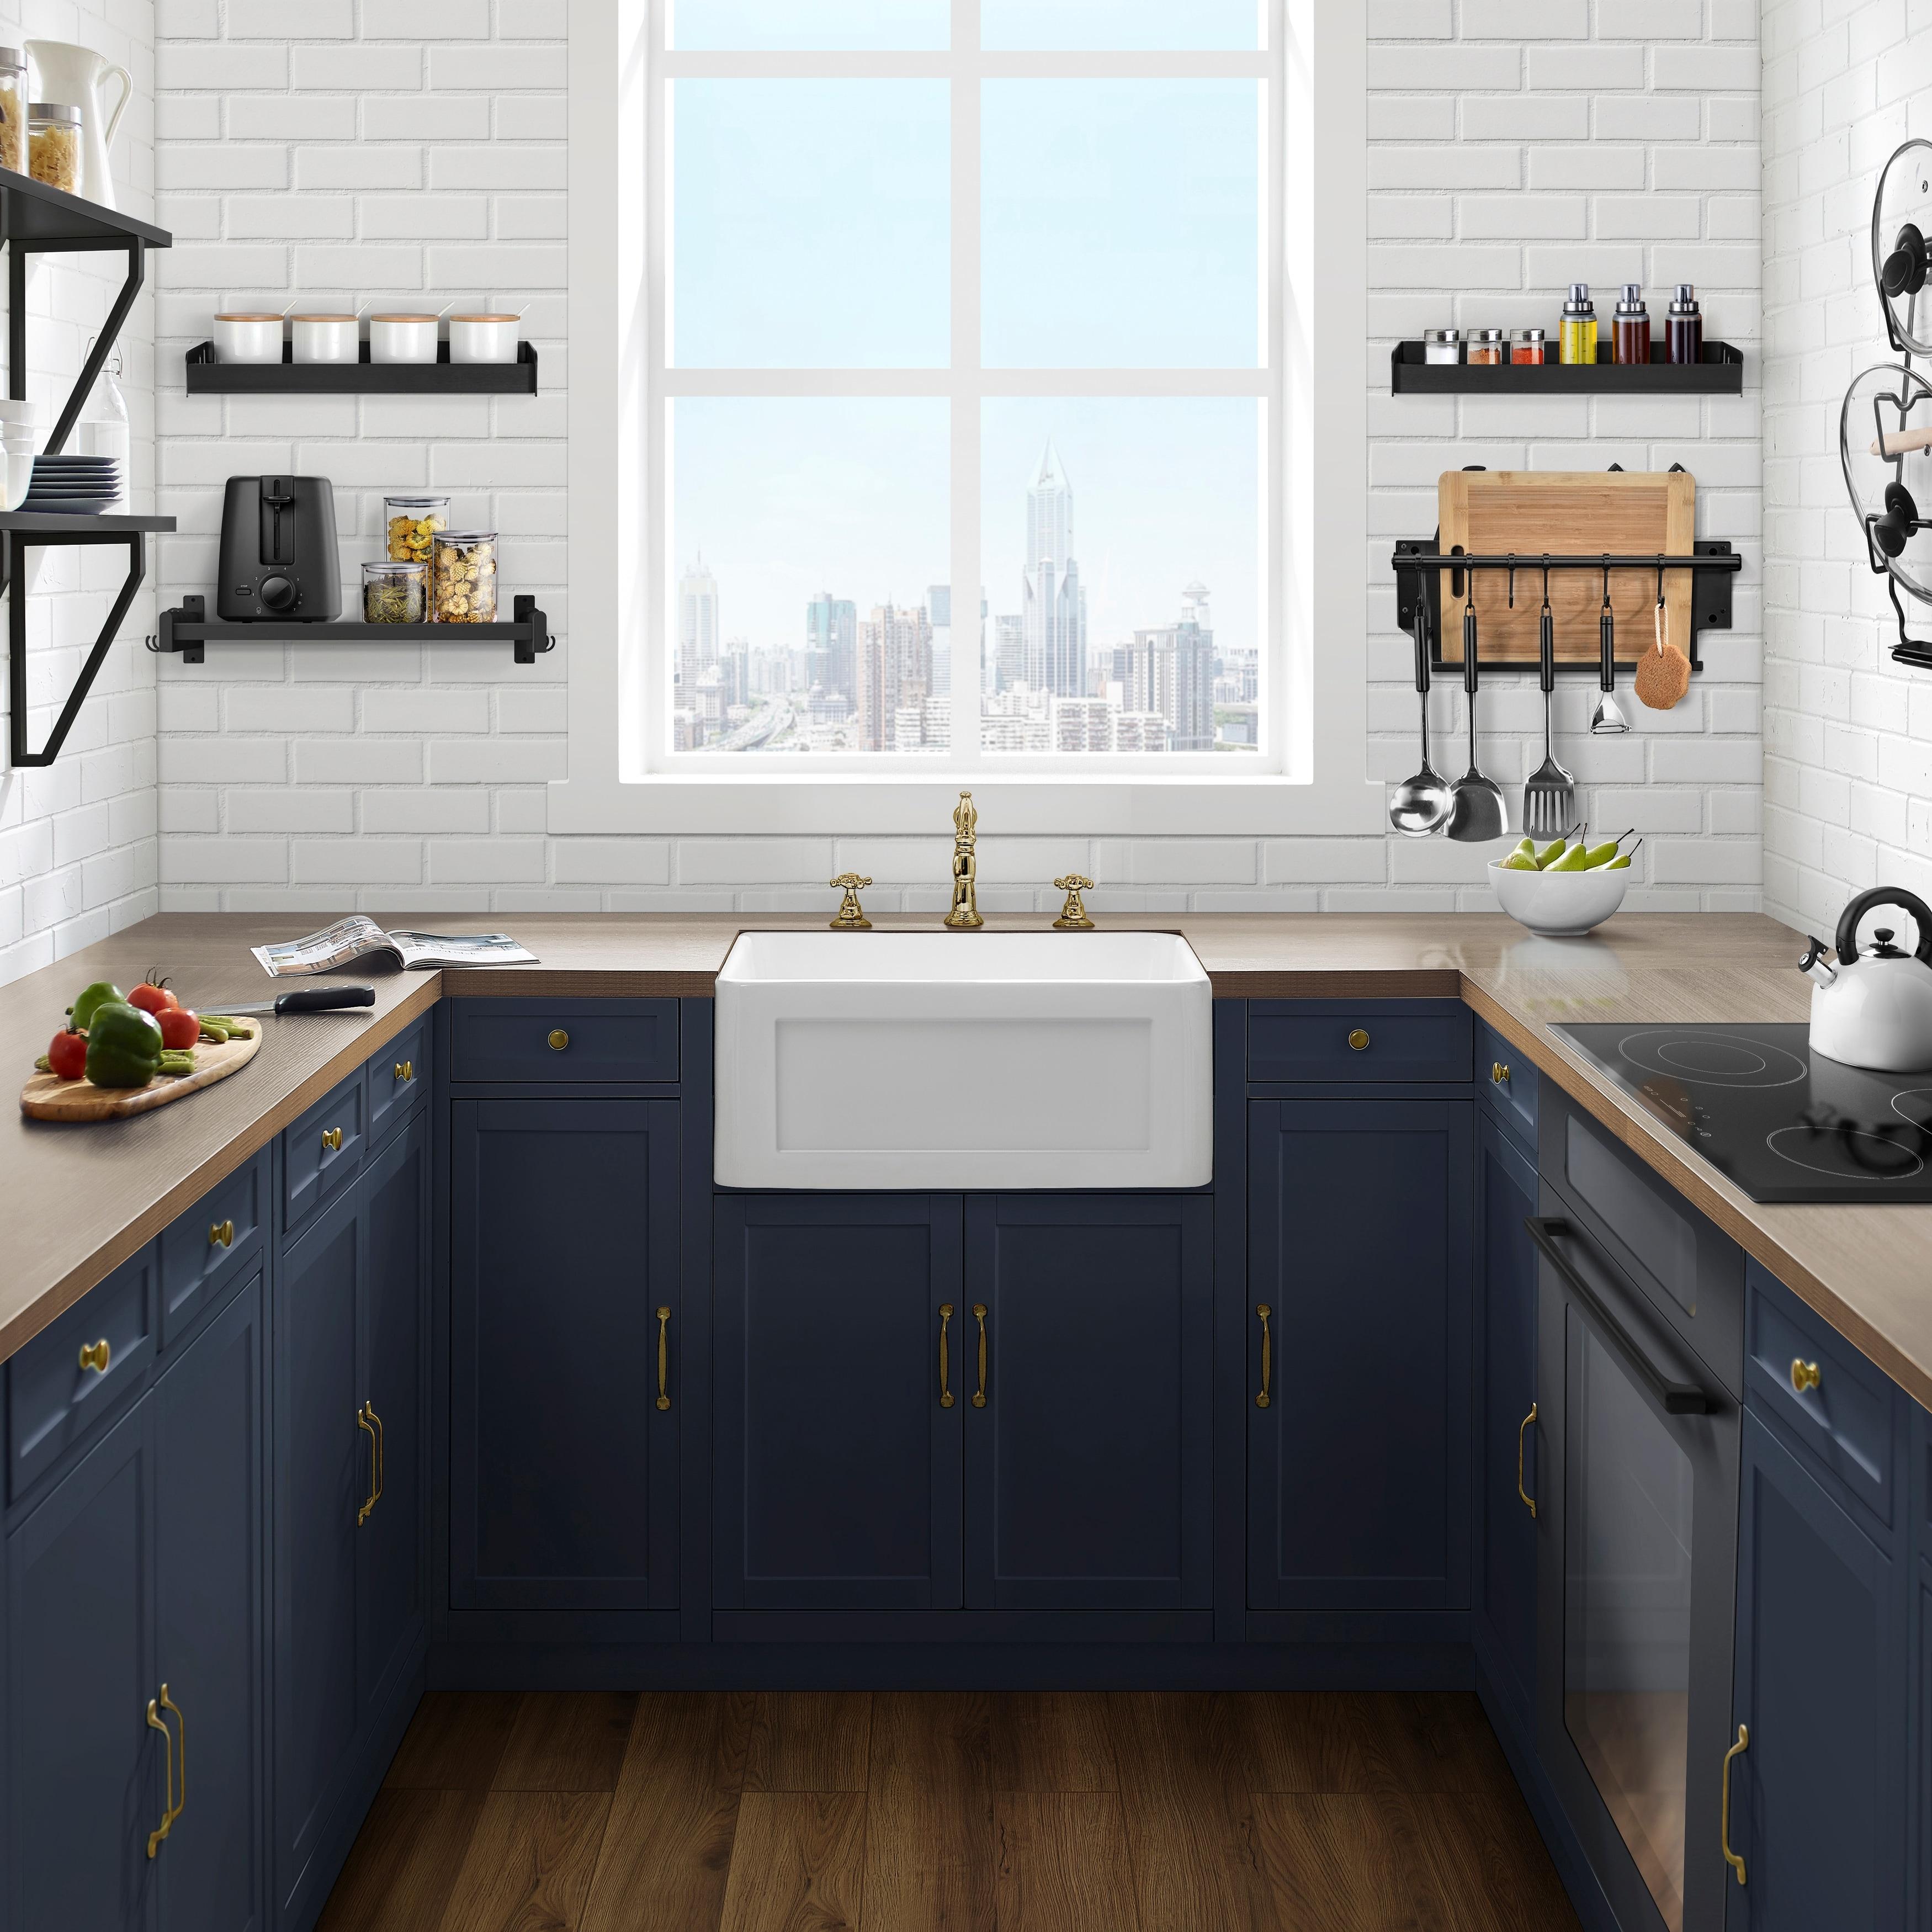 Shop Delice 24 X 18 Ceramic Farmhouse Kitchen Sink 24 X 18 Overstock 28228441